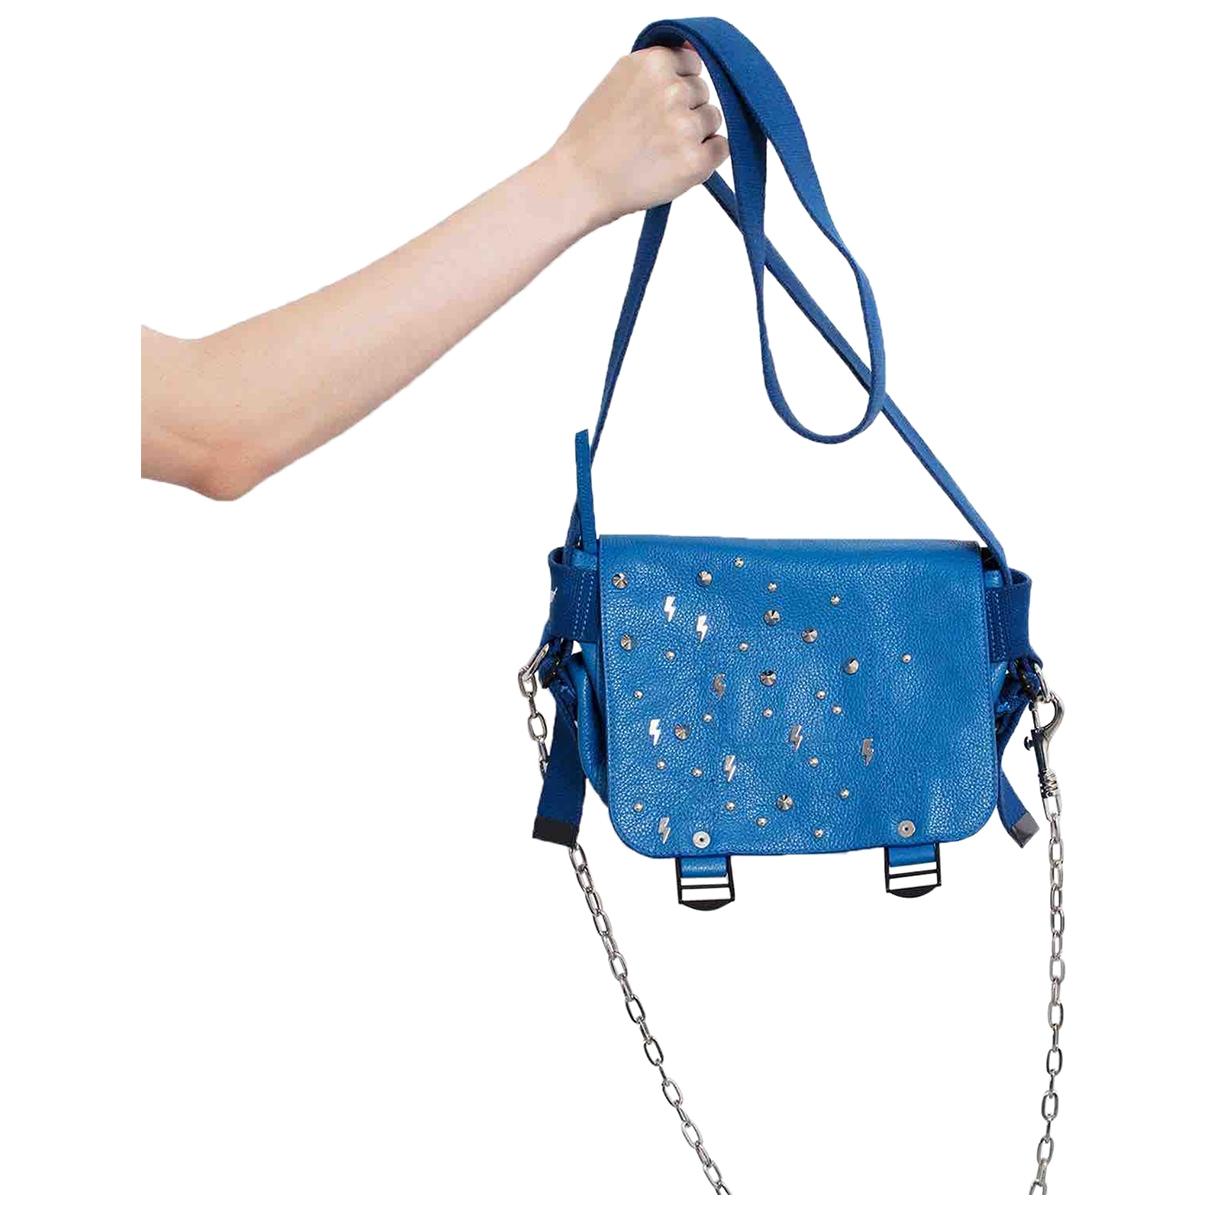 Zadig & Voltaire \N Blue Leather handbag for Women \N